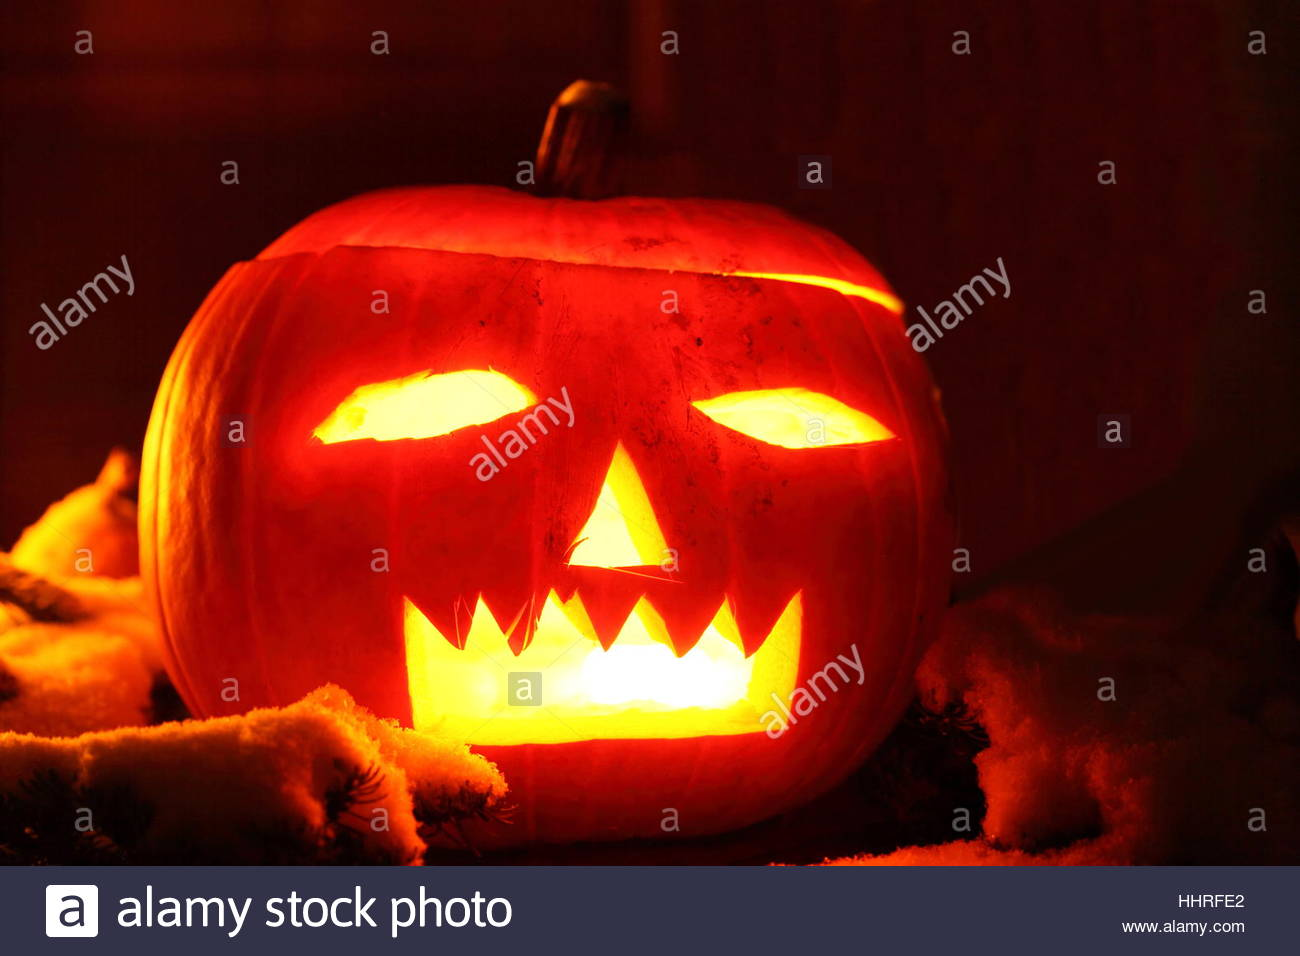 halloween pumpkin orange enthusiasm amusement enjoyment joy gag joke HHRFE2